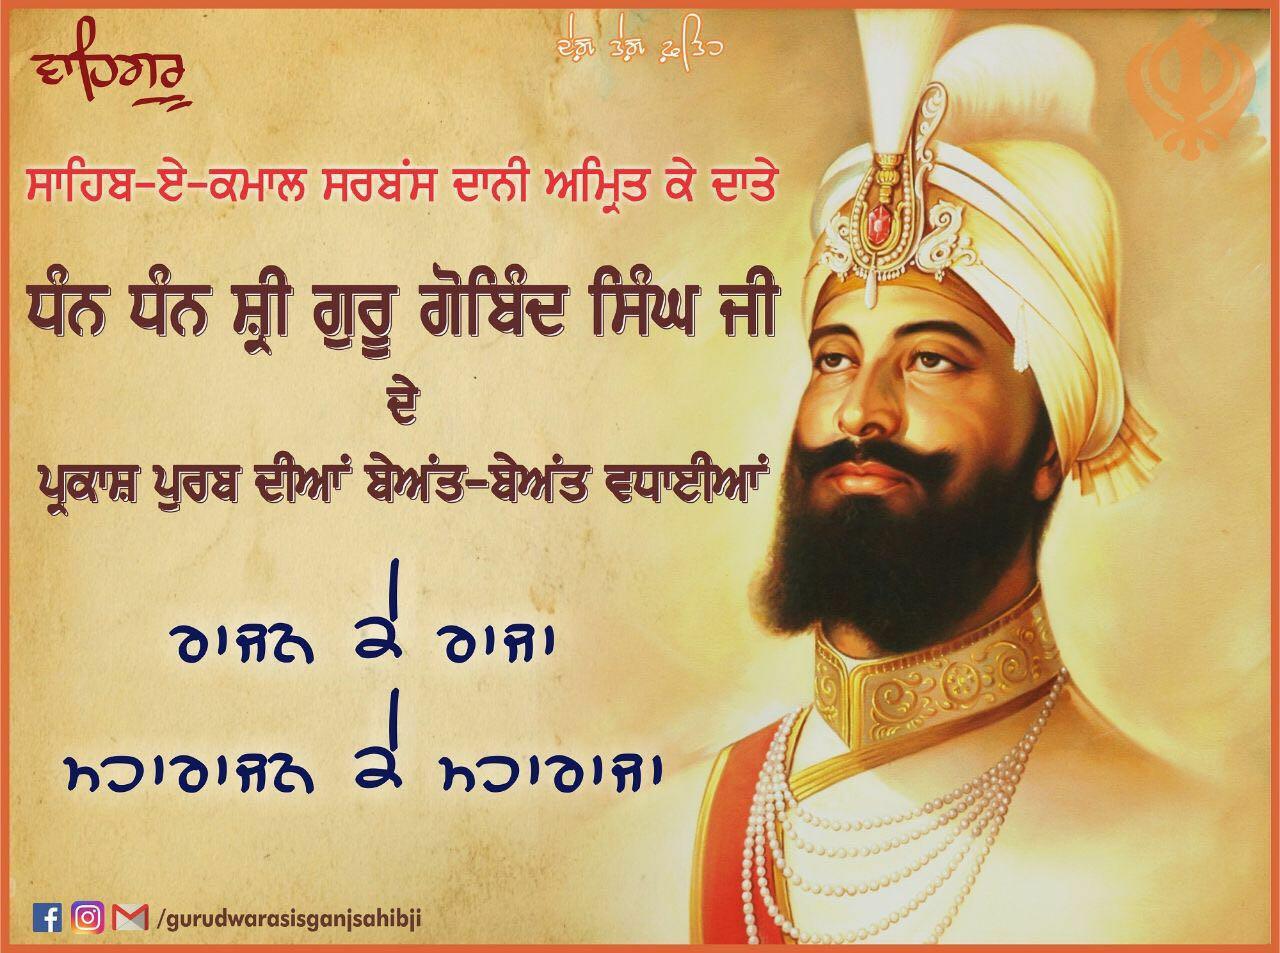 Happy Gurupurab Shri Guru Gobind Singh Pics Whatsapp Images